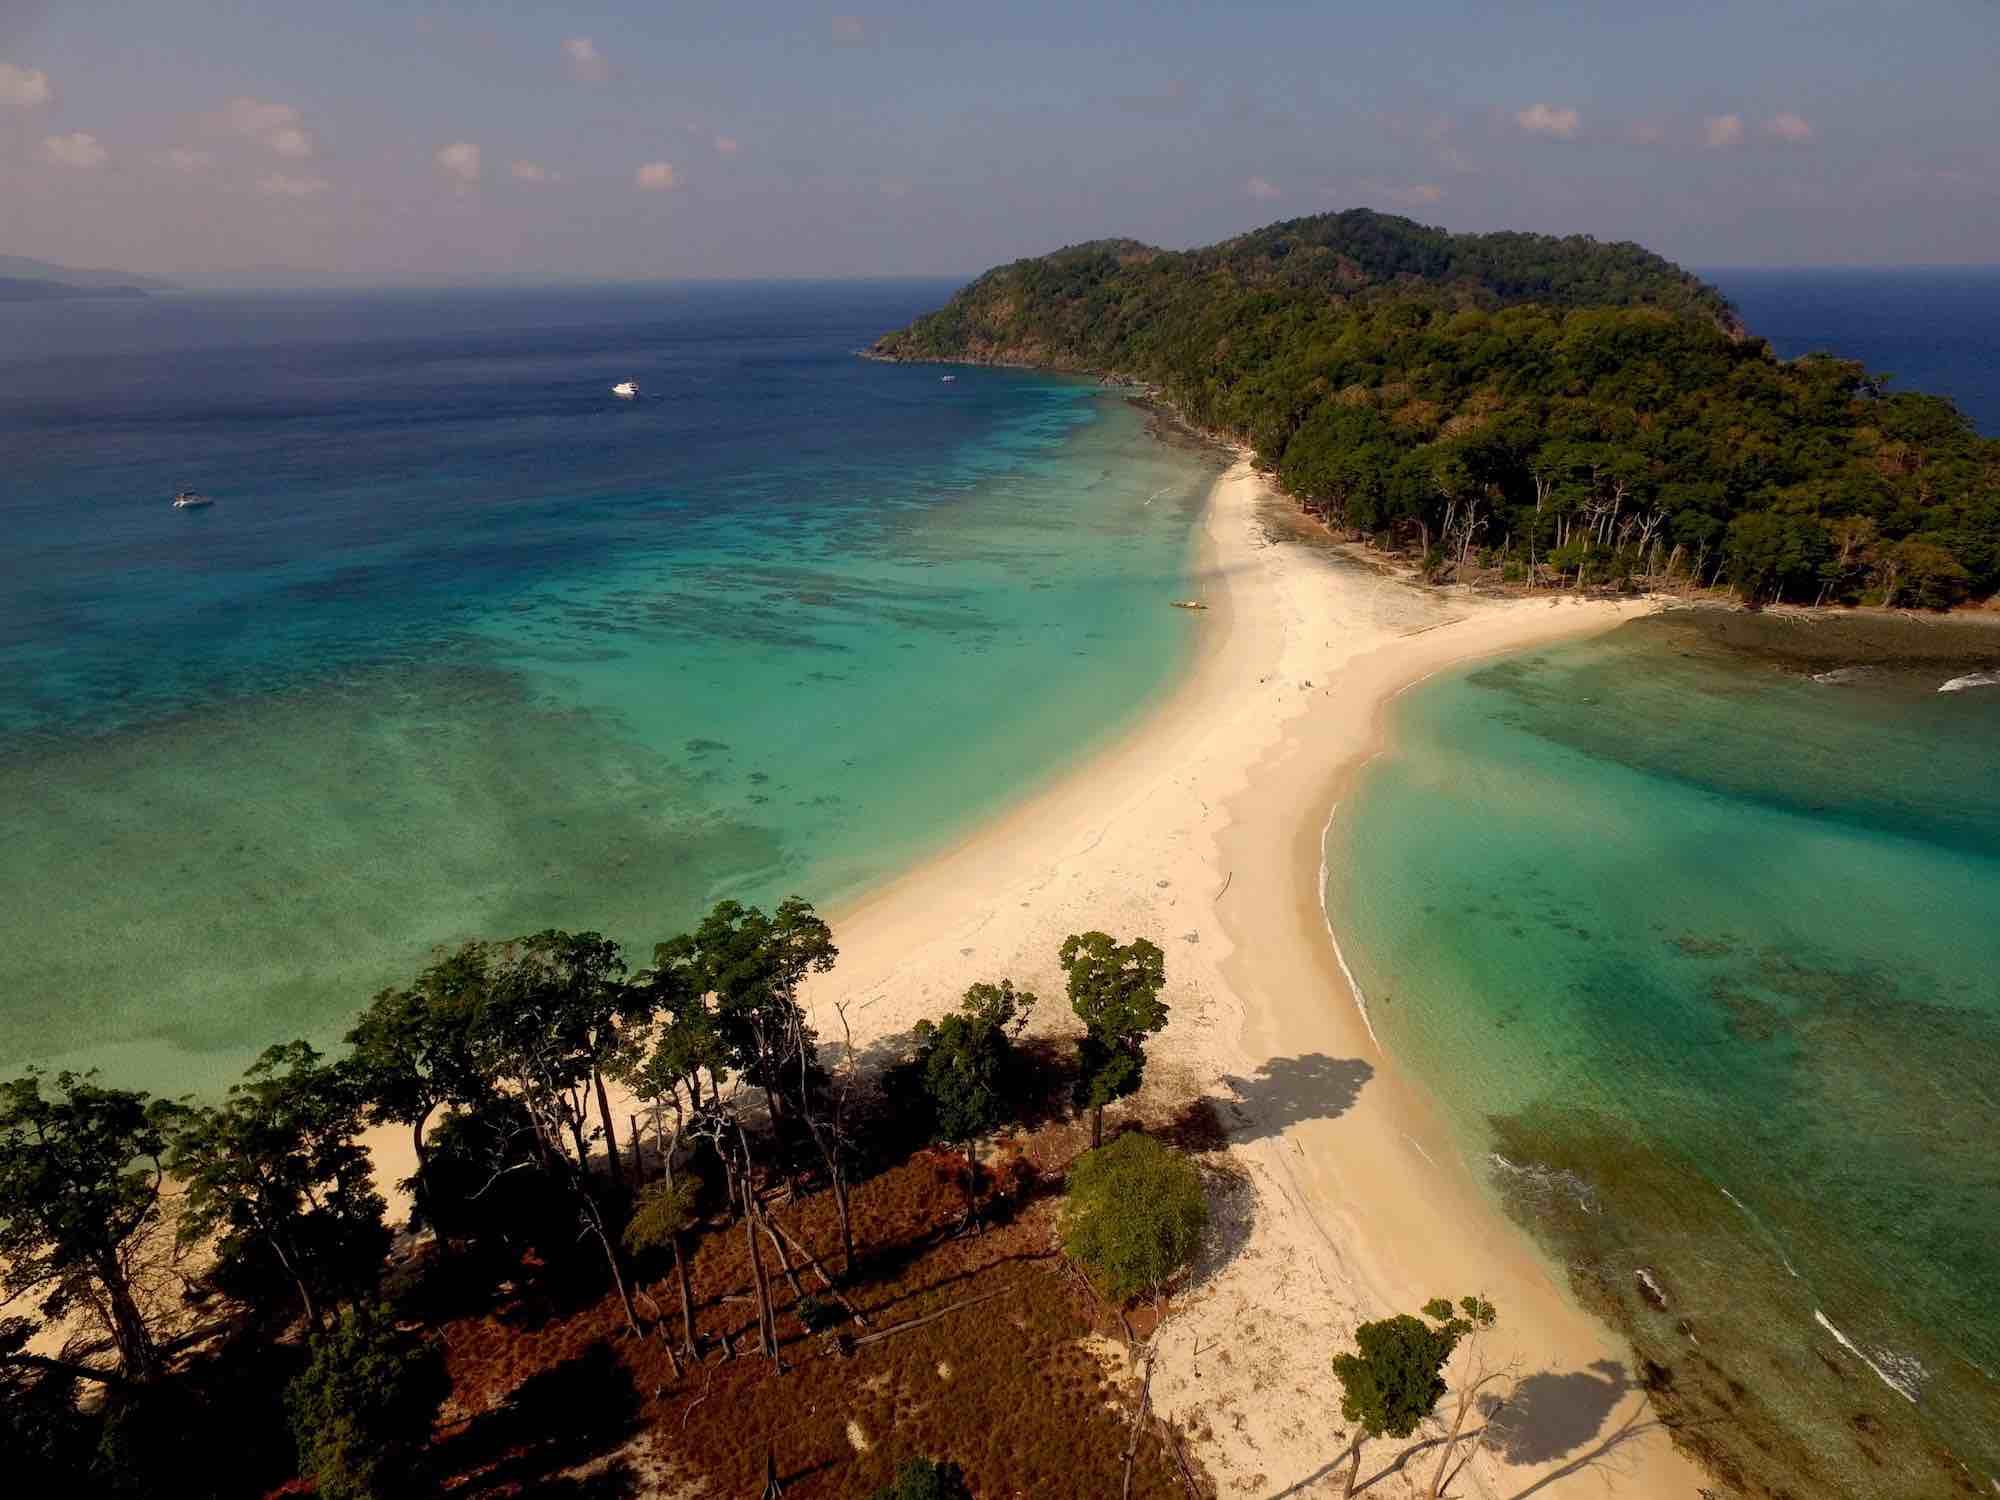 Andaman Islands_drone photo of amazing islands travelling on boat_XS.jpeg